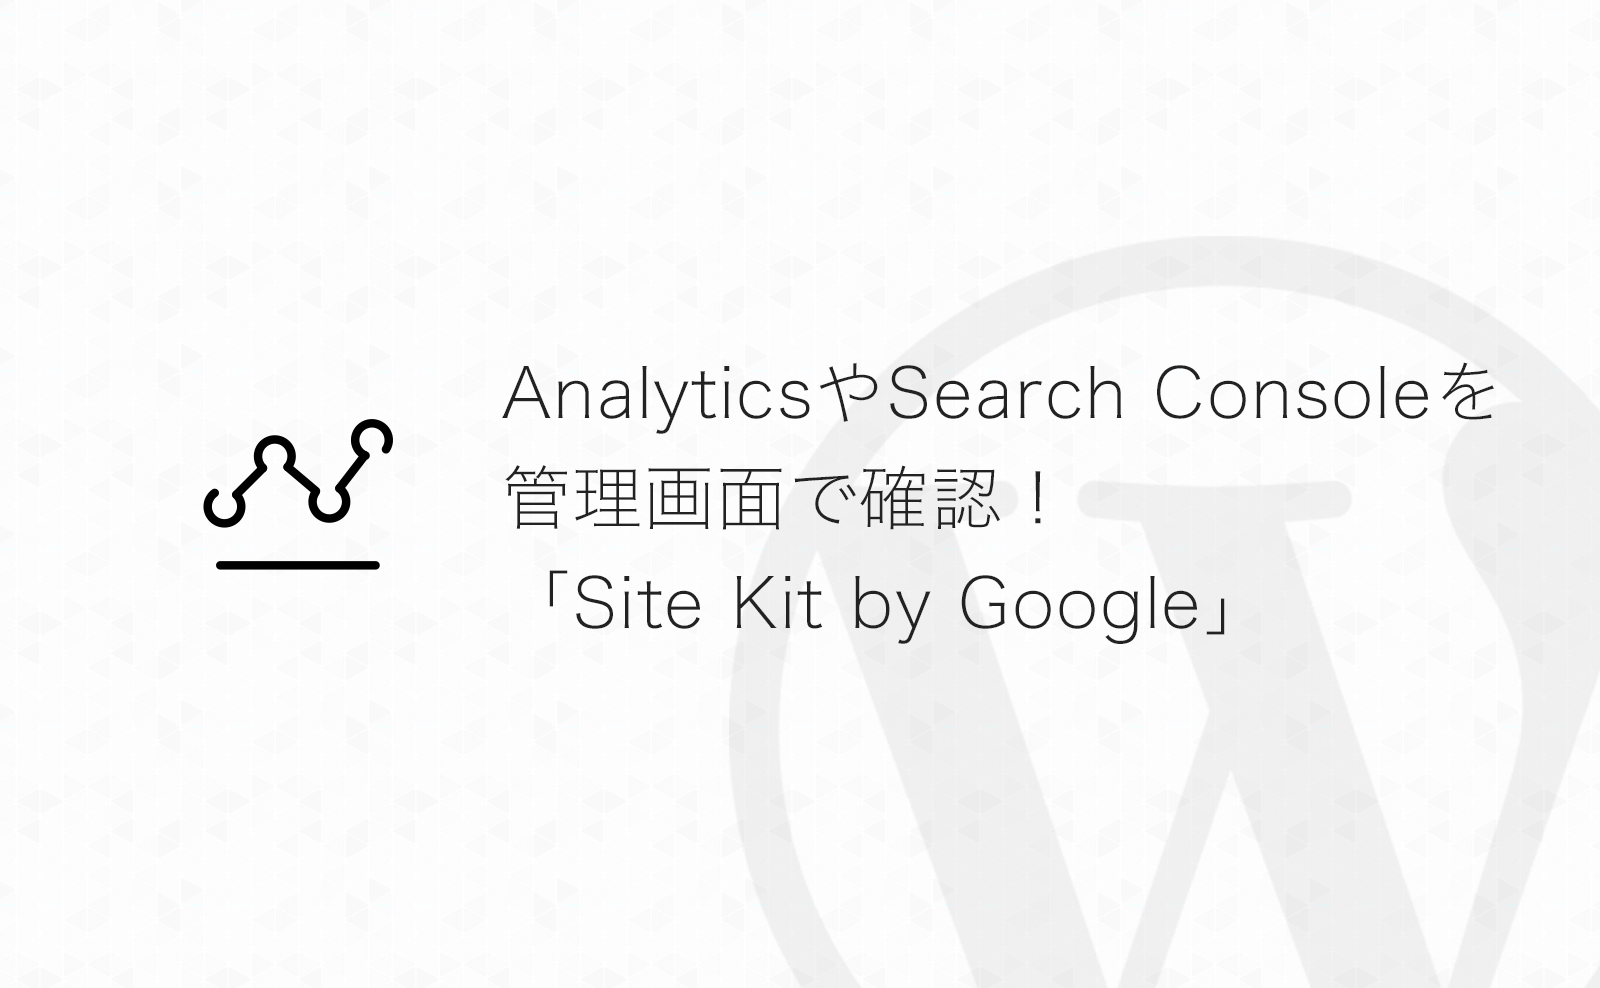 【WordPress】Google AnalyticsやSearch Consoleを管理画面で確認!神プラグイン「Site Kit by Google」の使い方・設定方法